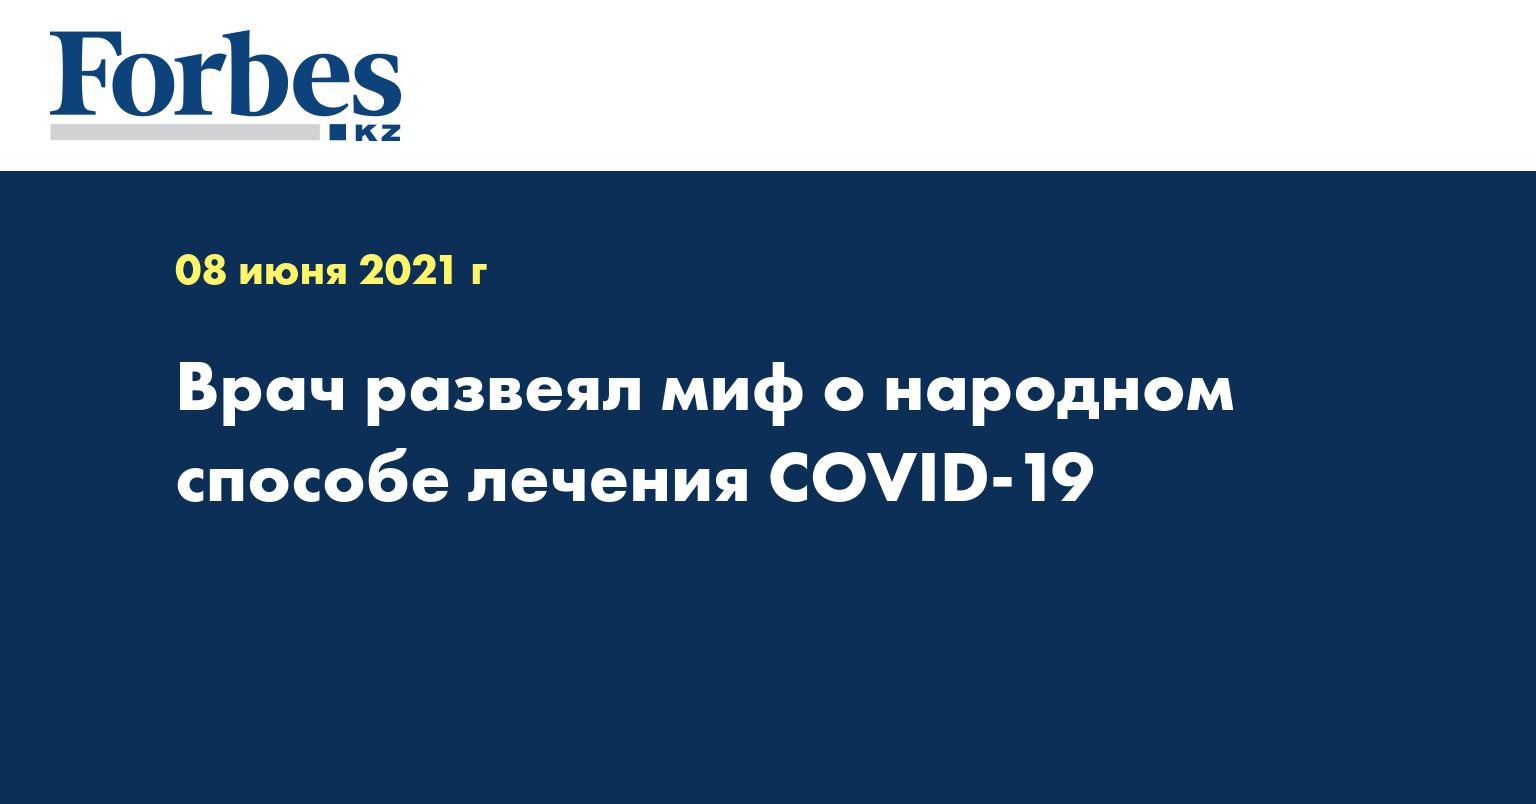 Врач развеял миф о народном способе лечения COVID-19